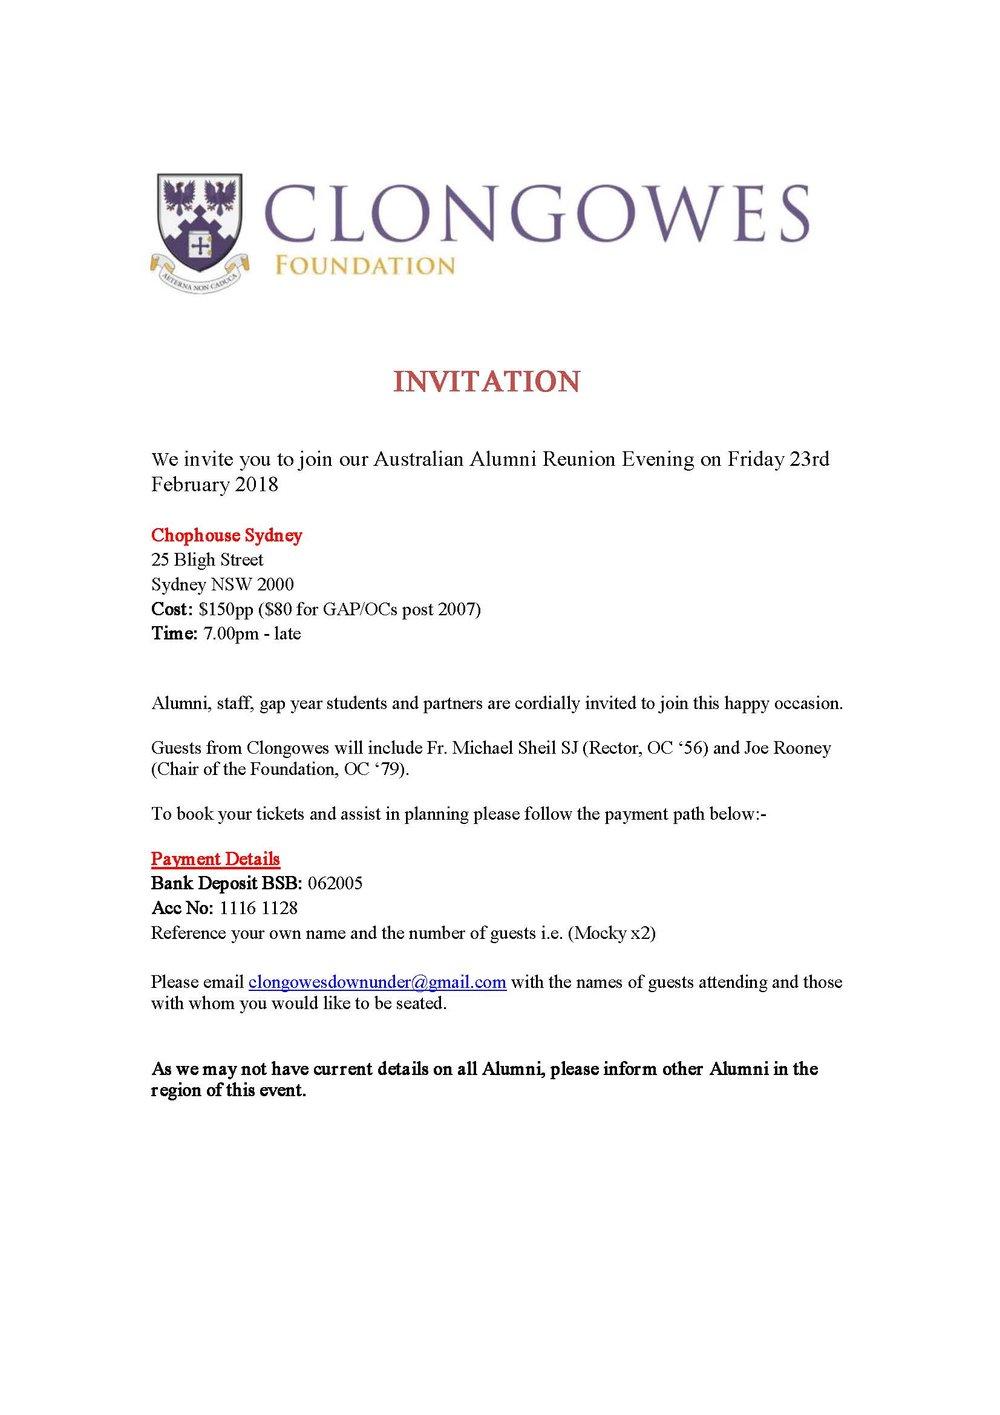 Clongowes Australian Alumni Reunion Evening 2018 Invite.jpg